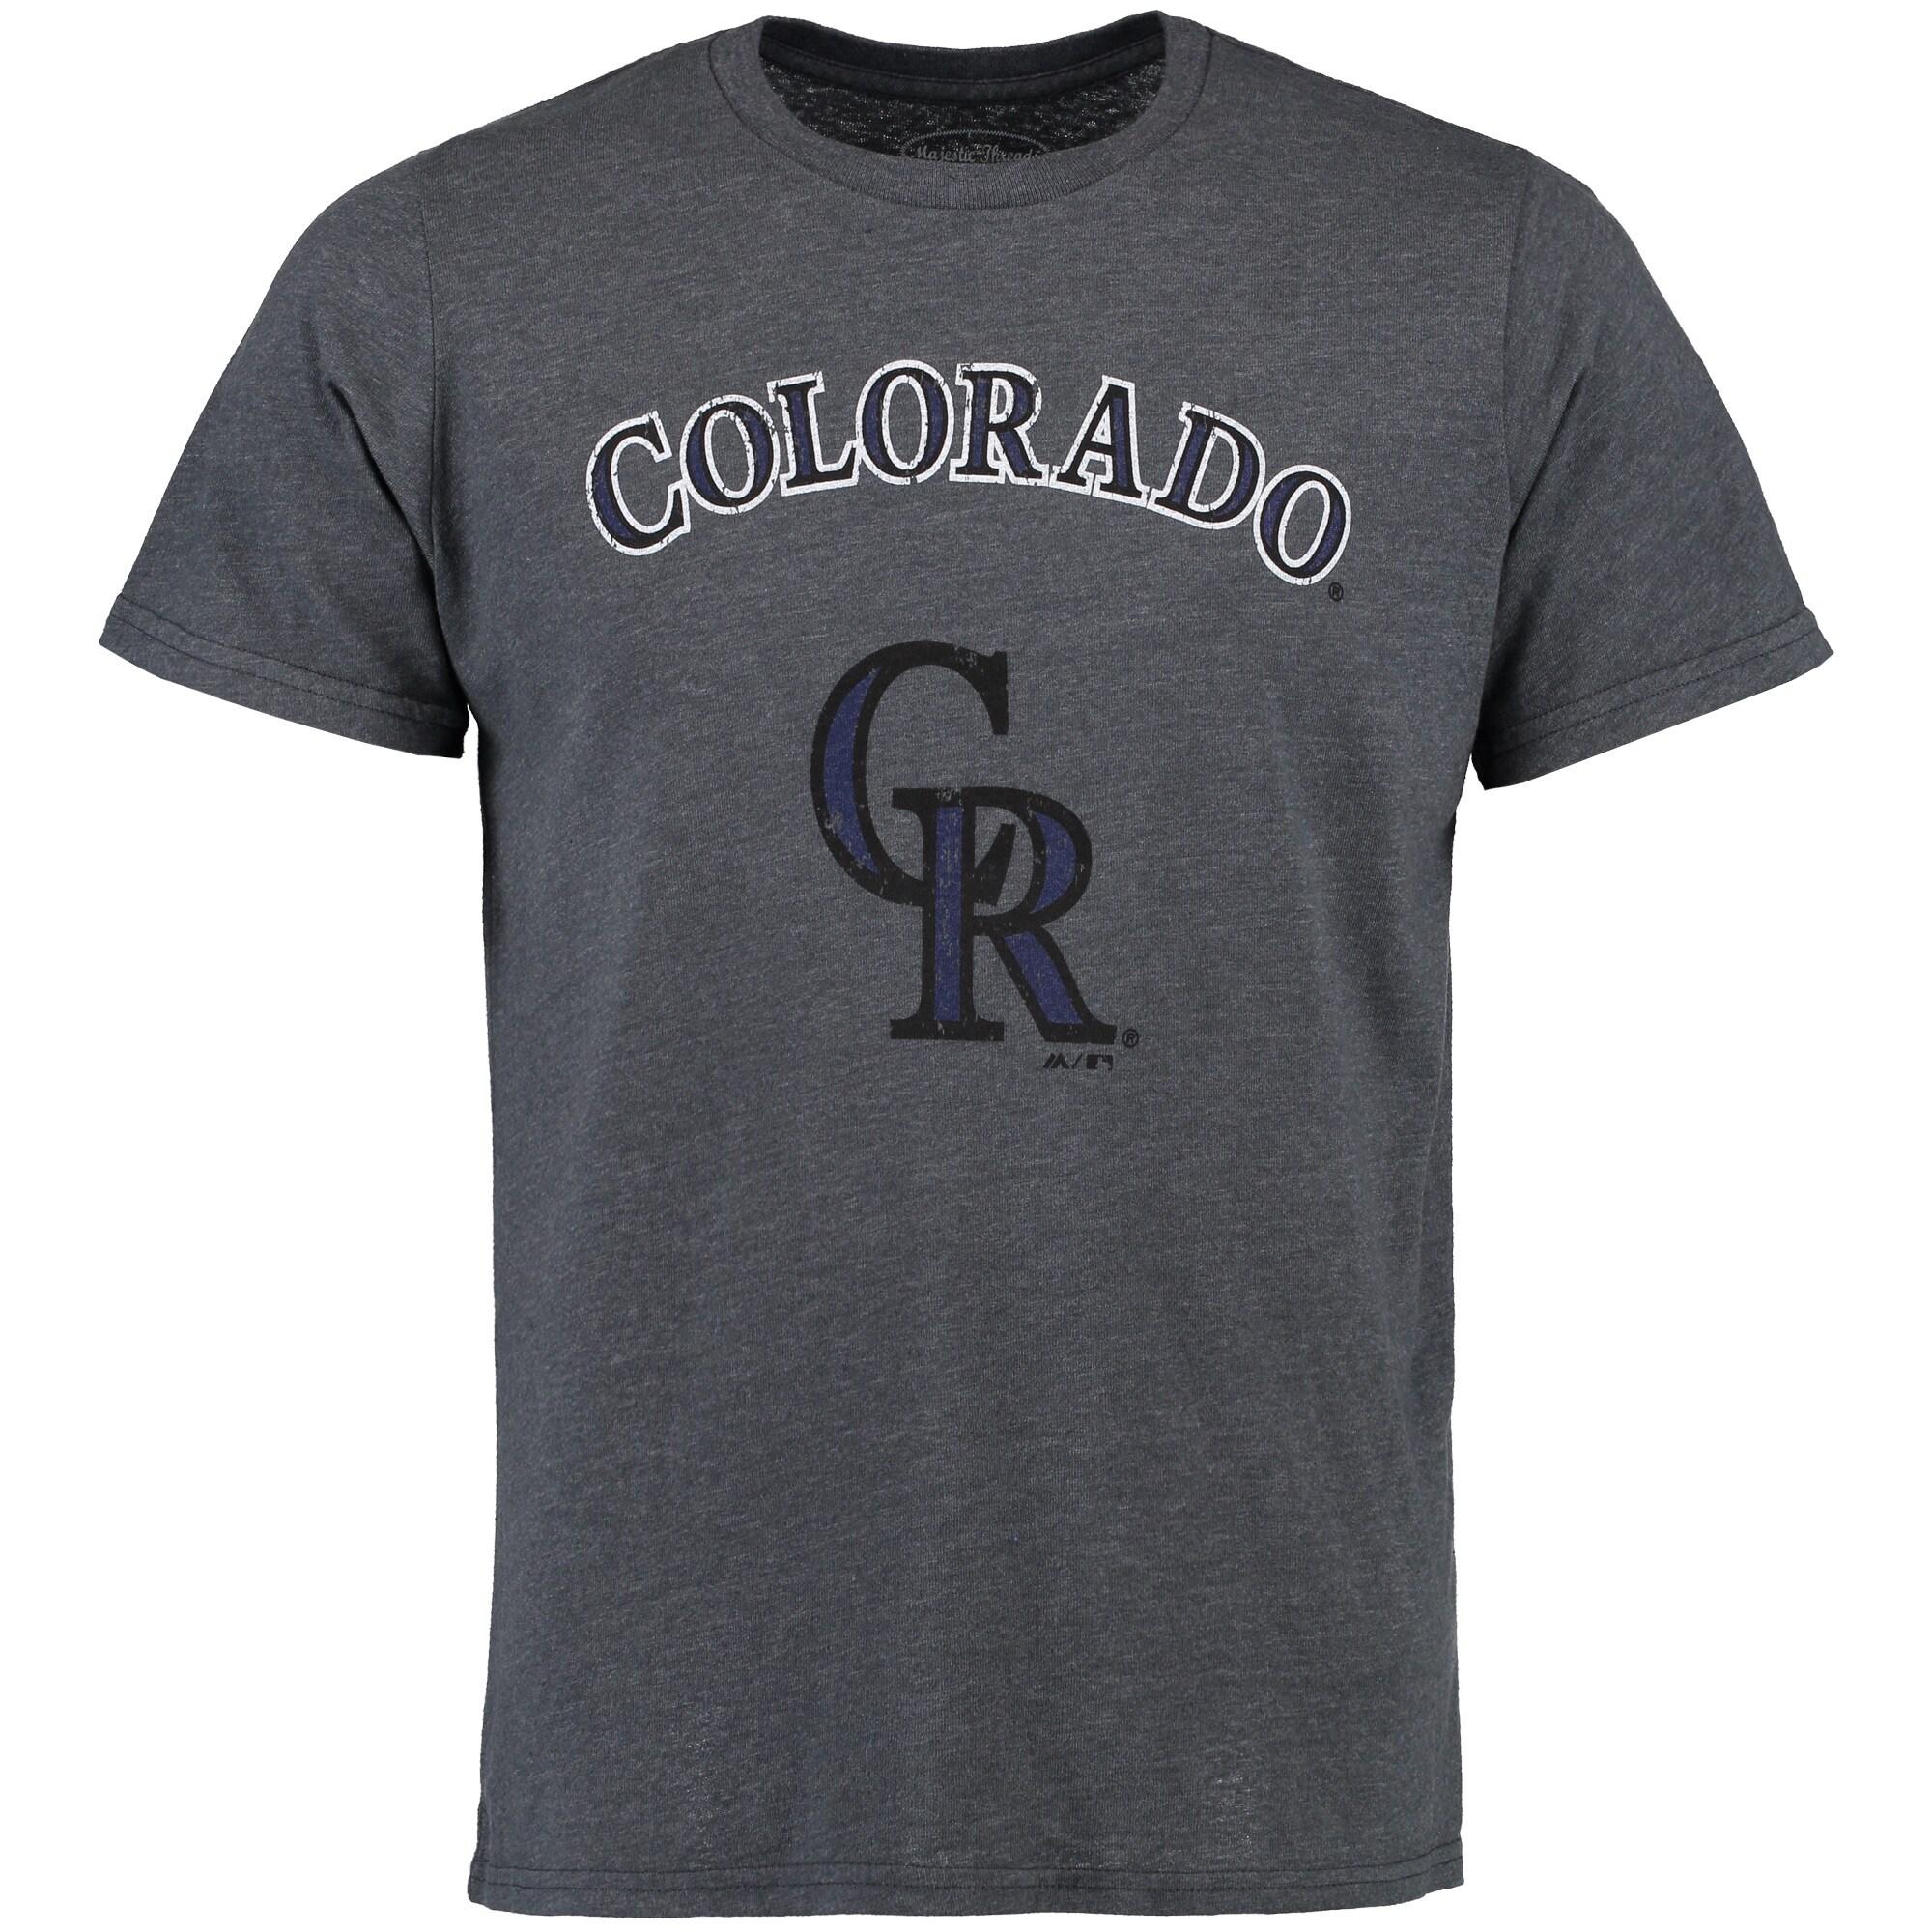 Colorado Rockies Majestic Threads Premium Granite Tri-Blend T-Shirt - Charcoal